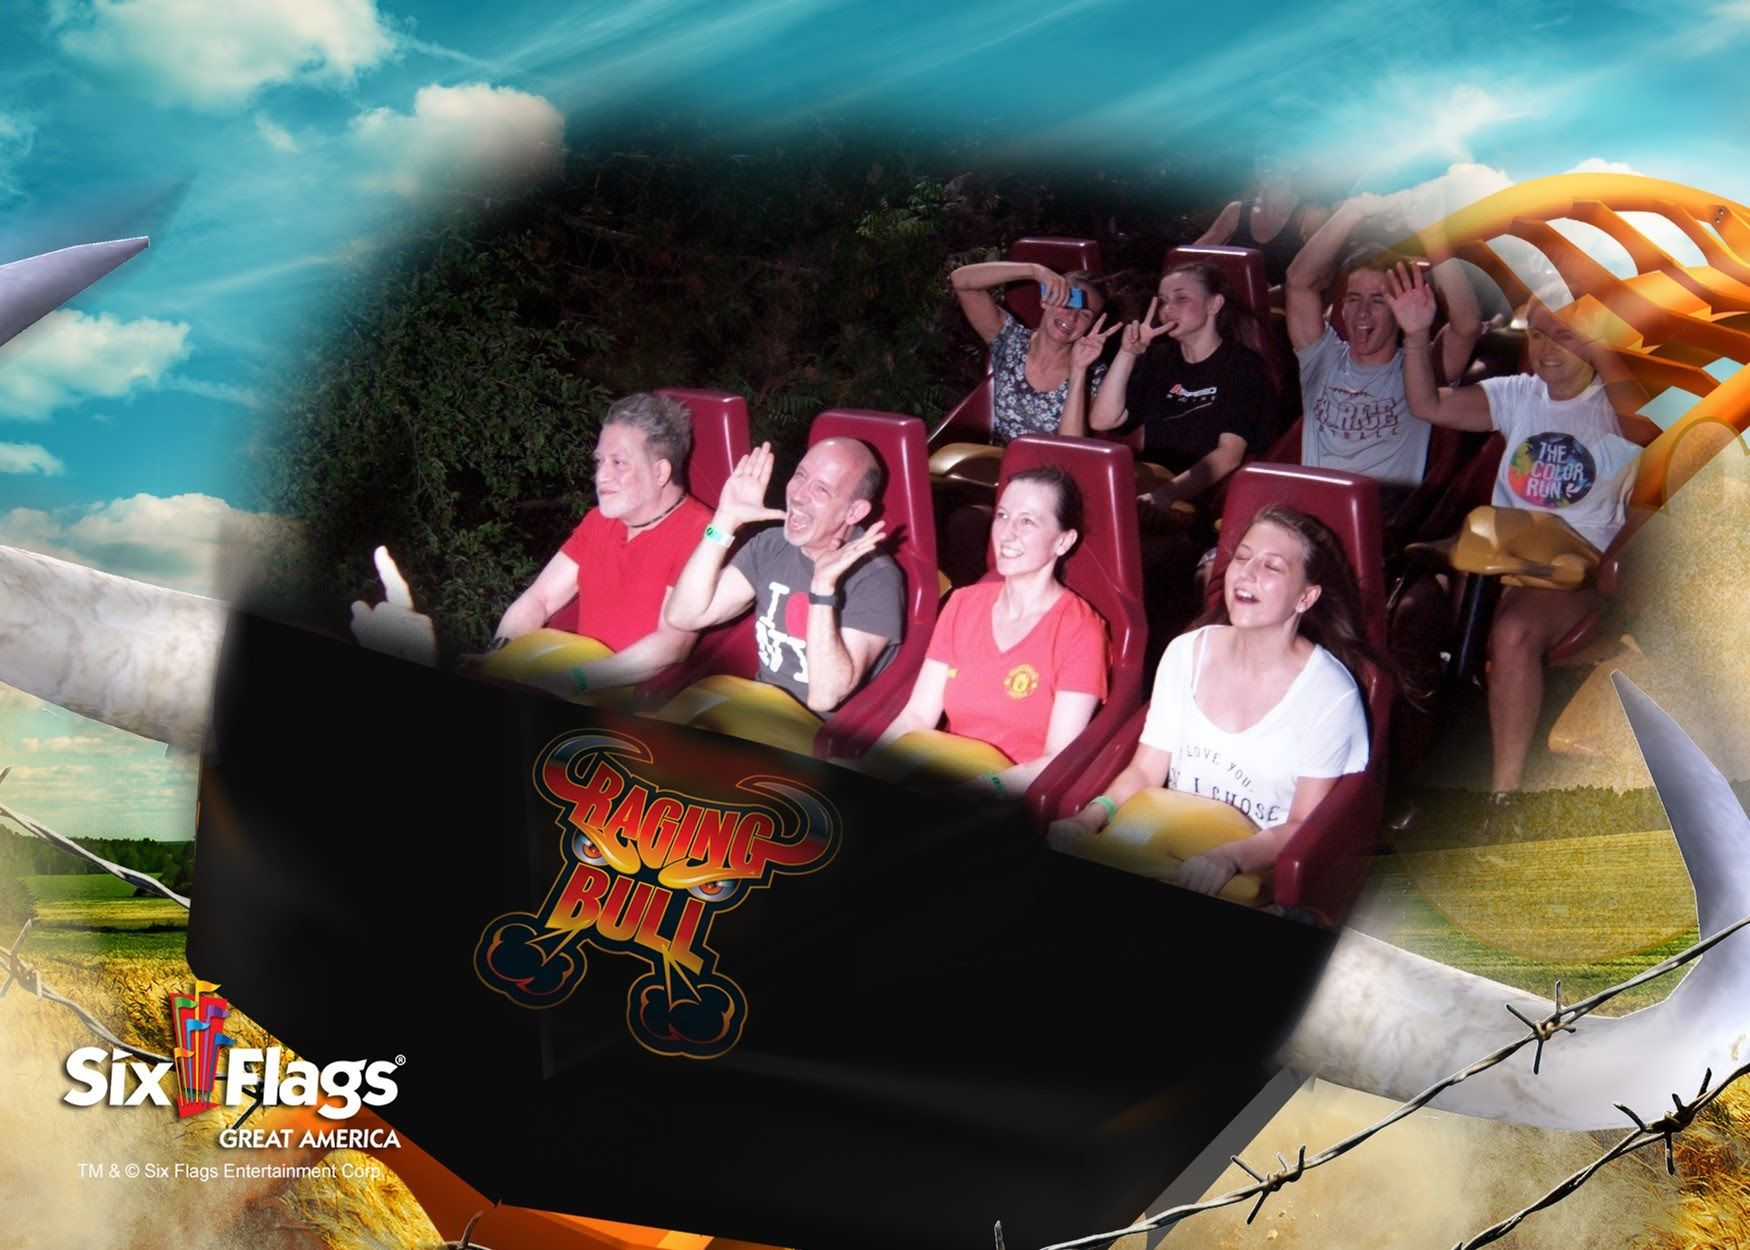 Coasterselfie Sunday Ragingbull Rollercoaster Themepark Fun Amusementpark Coaster Photography Rollercoasters T Thrill Ride Cedar Point Amusement Park